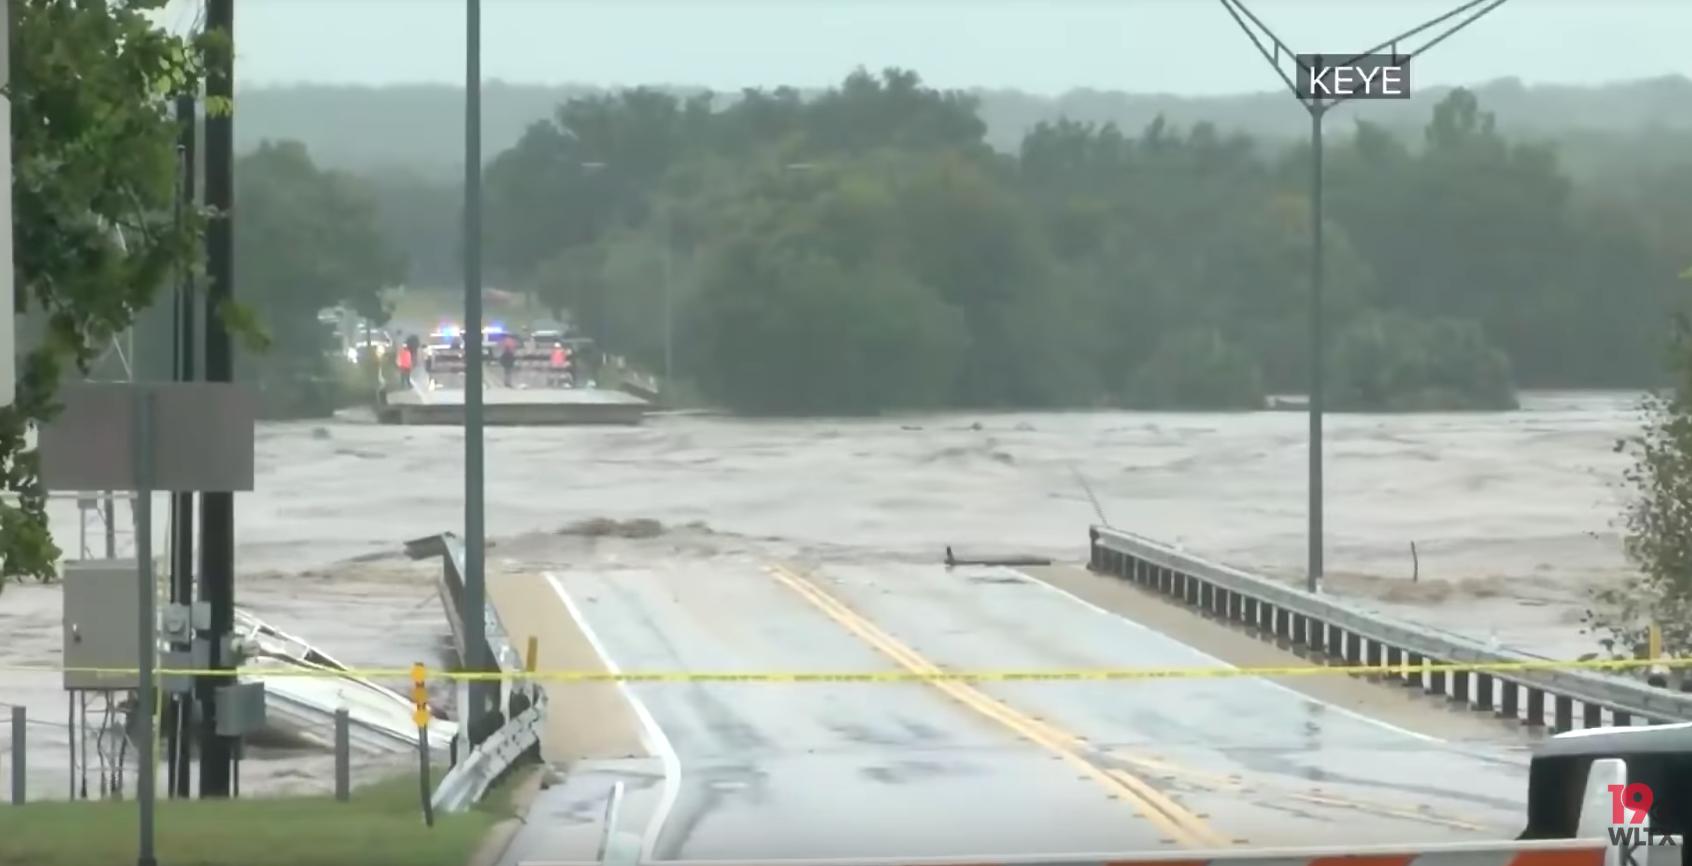 Flooded RM 2900 bridge in Kingsland, Texas